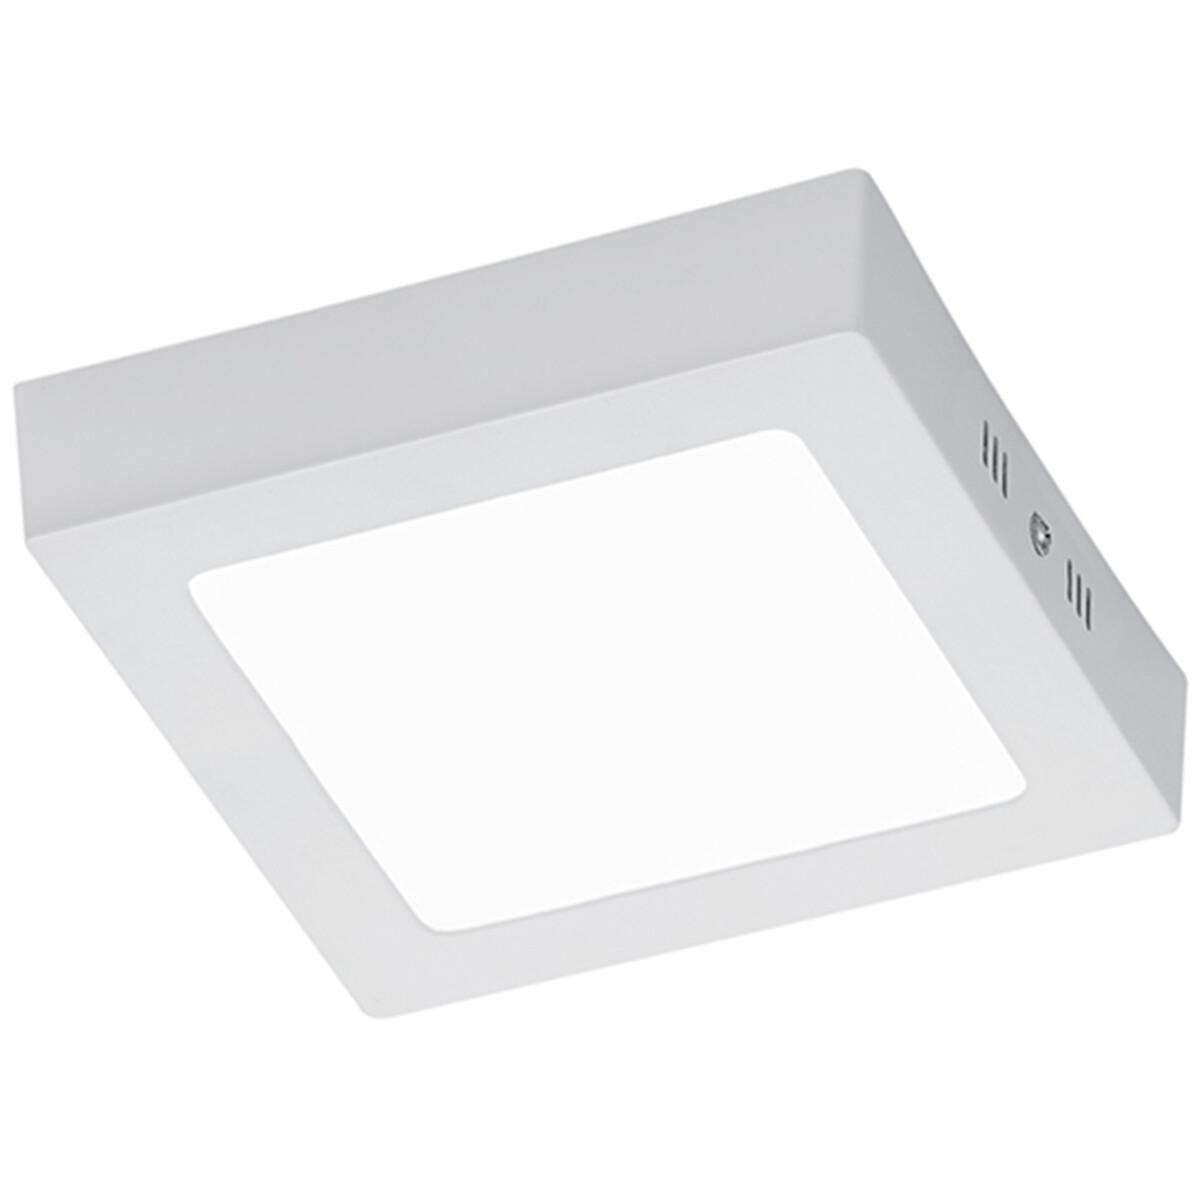 LED Plafondlamp - Plafondverlichting - Trion Zonin - 12W - Warm Wit 3000K - Vierkant - Mat Wit - Alu